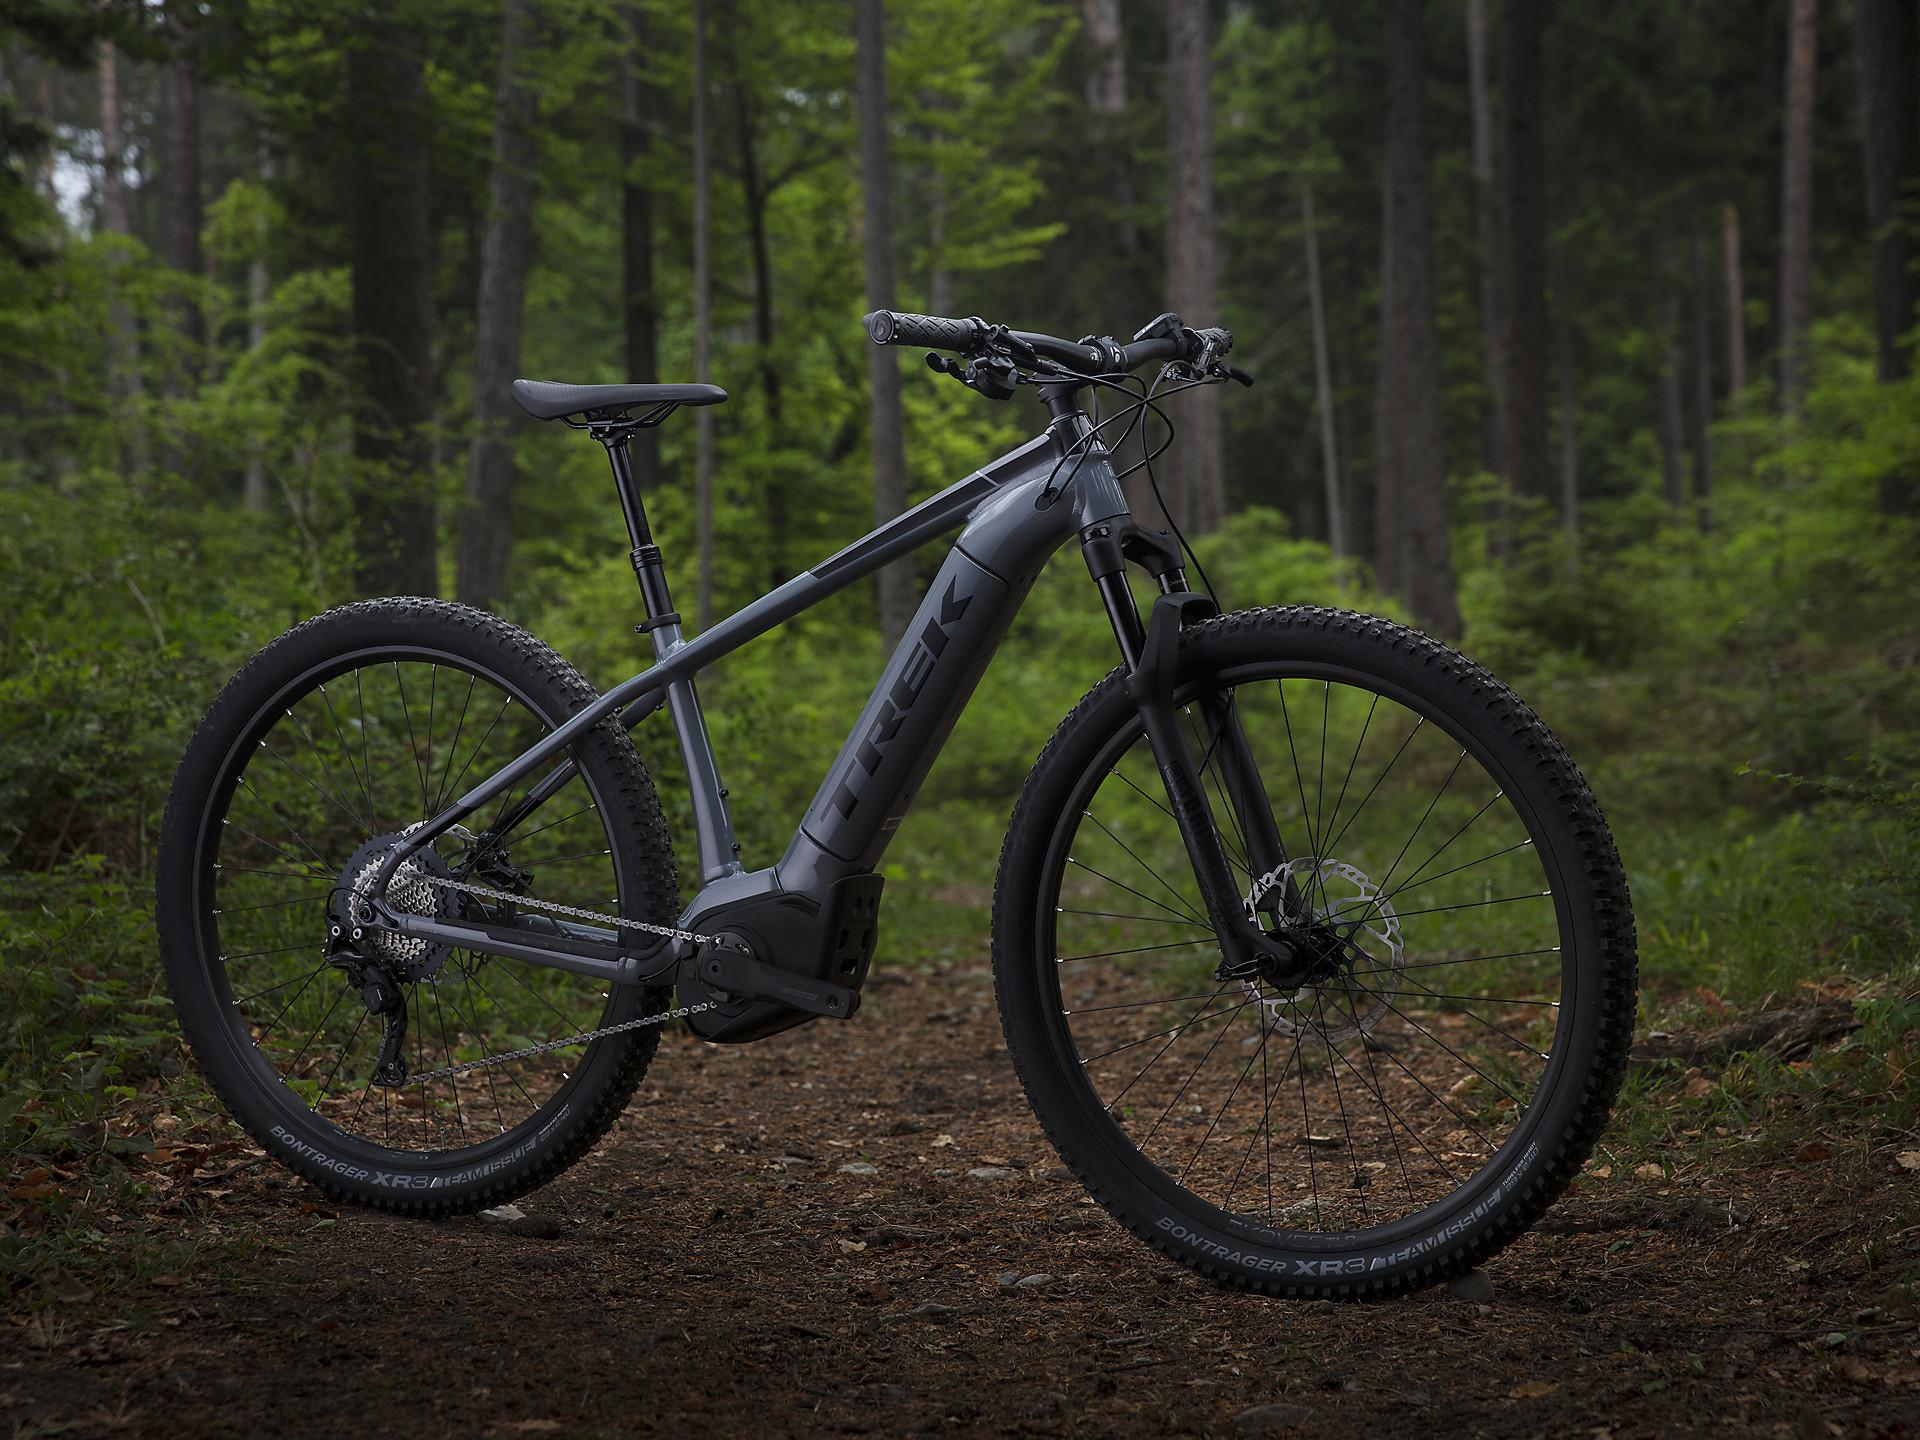 Powerfly 7 Trek Bikes It